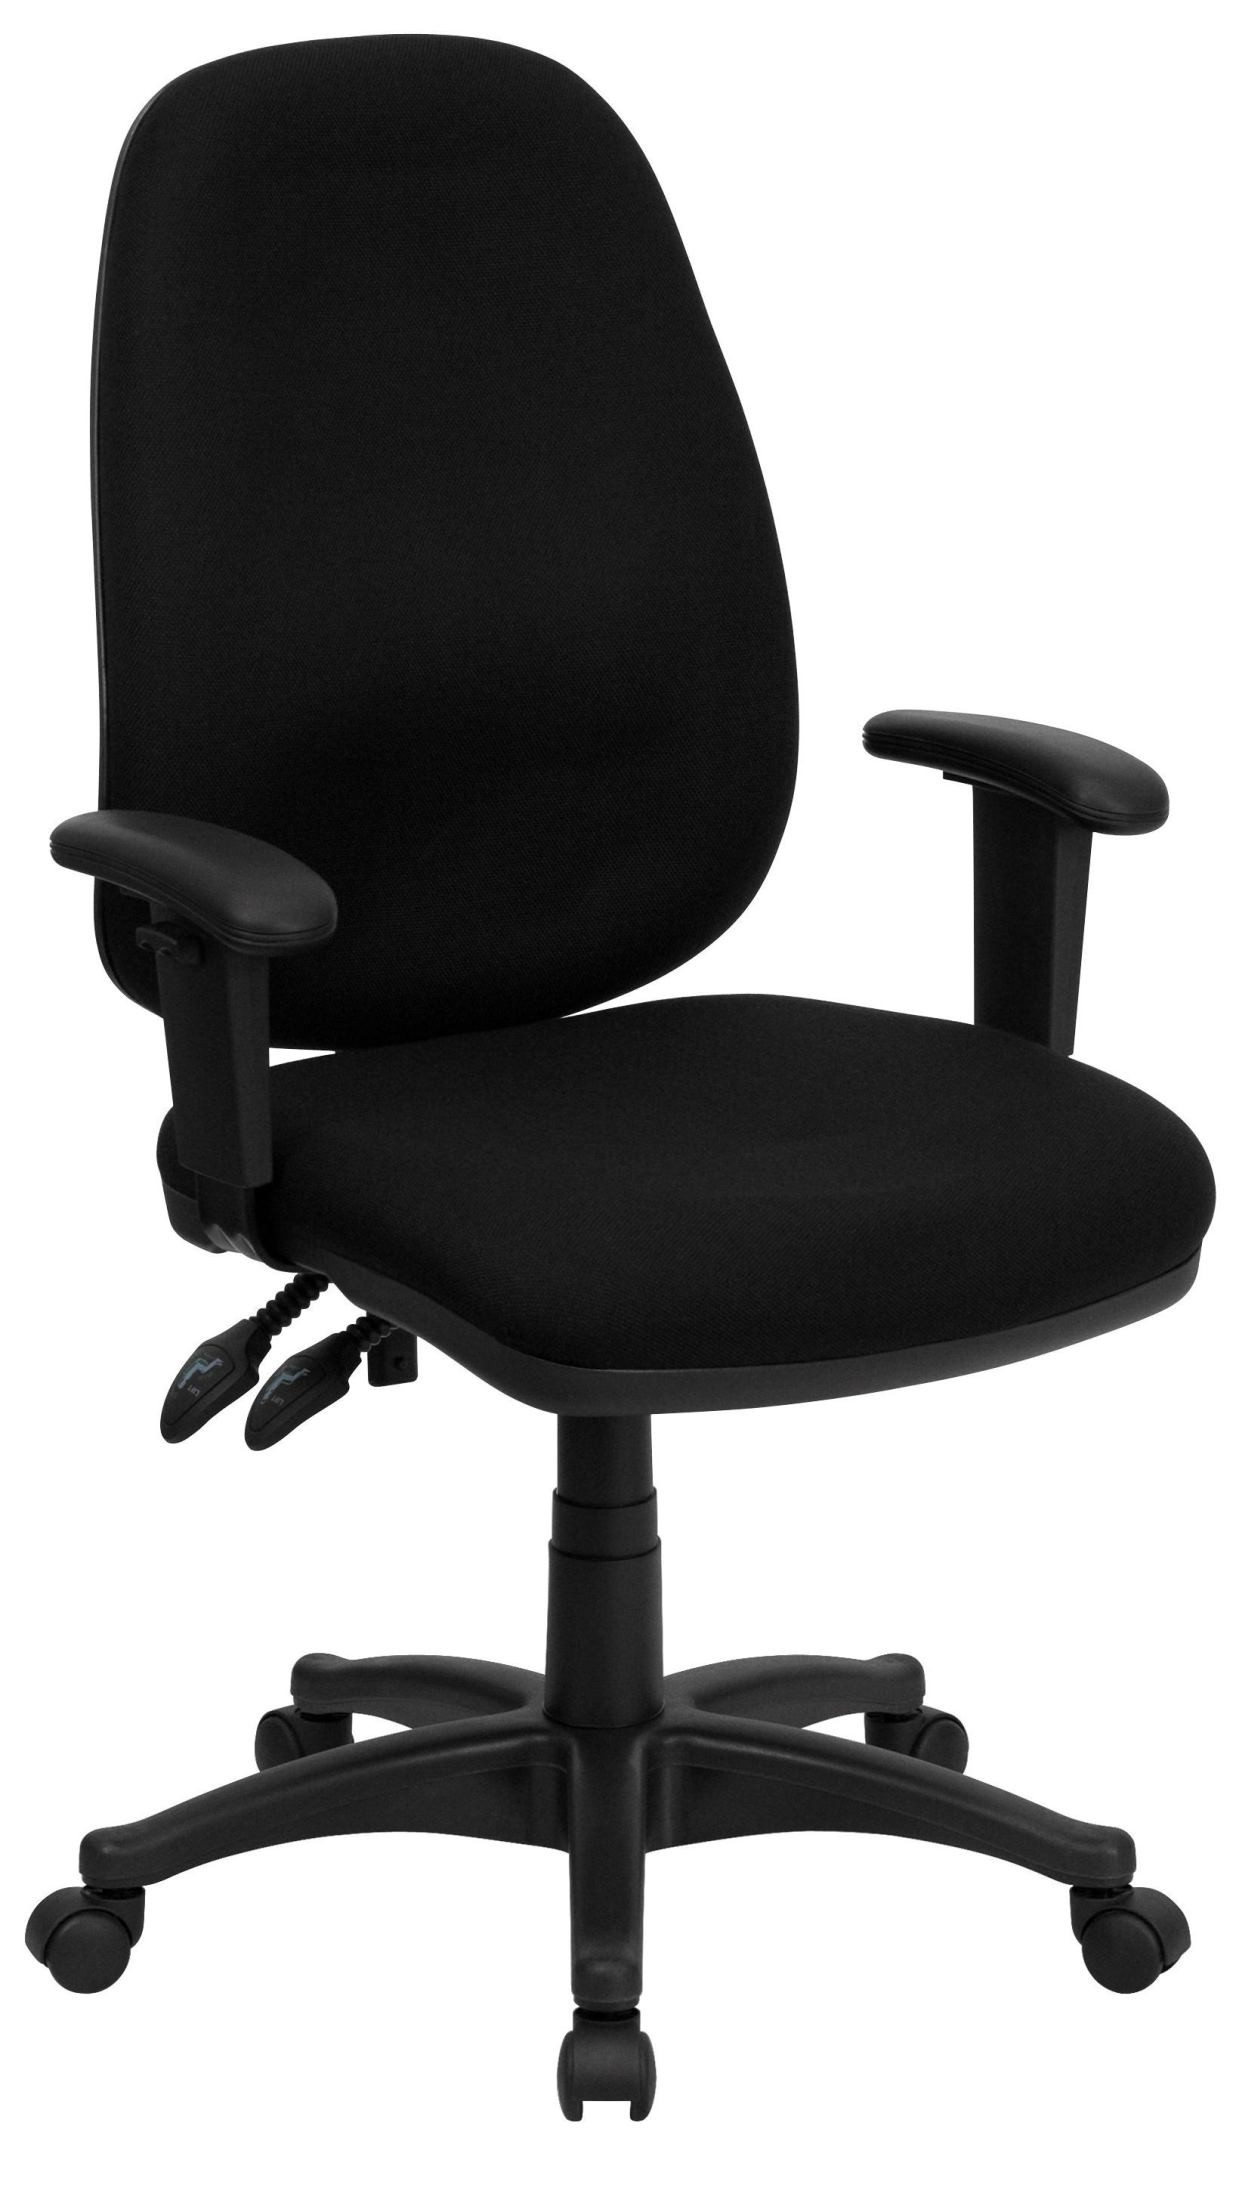 high back black ergonomic computer arm chair from renegade coleman furniture. Black Bedroom Furniture Sets. Home Design Ideas